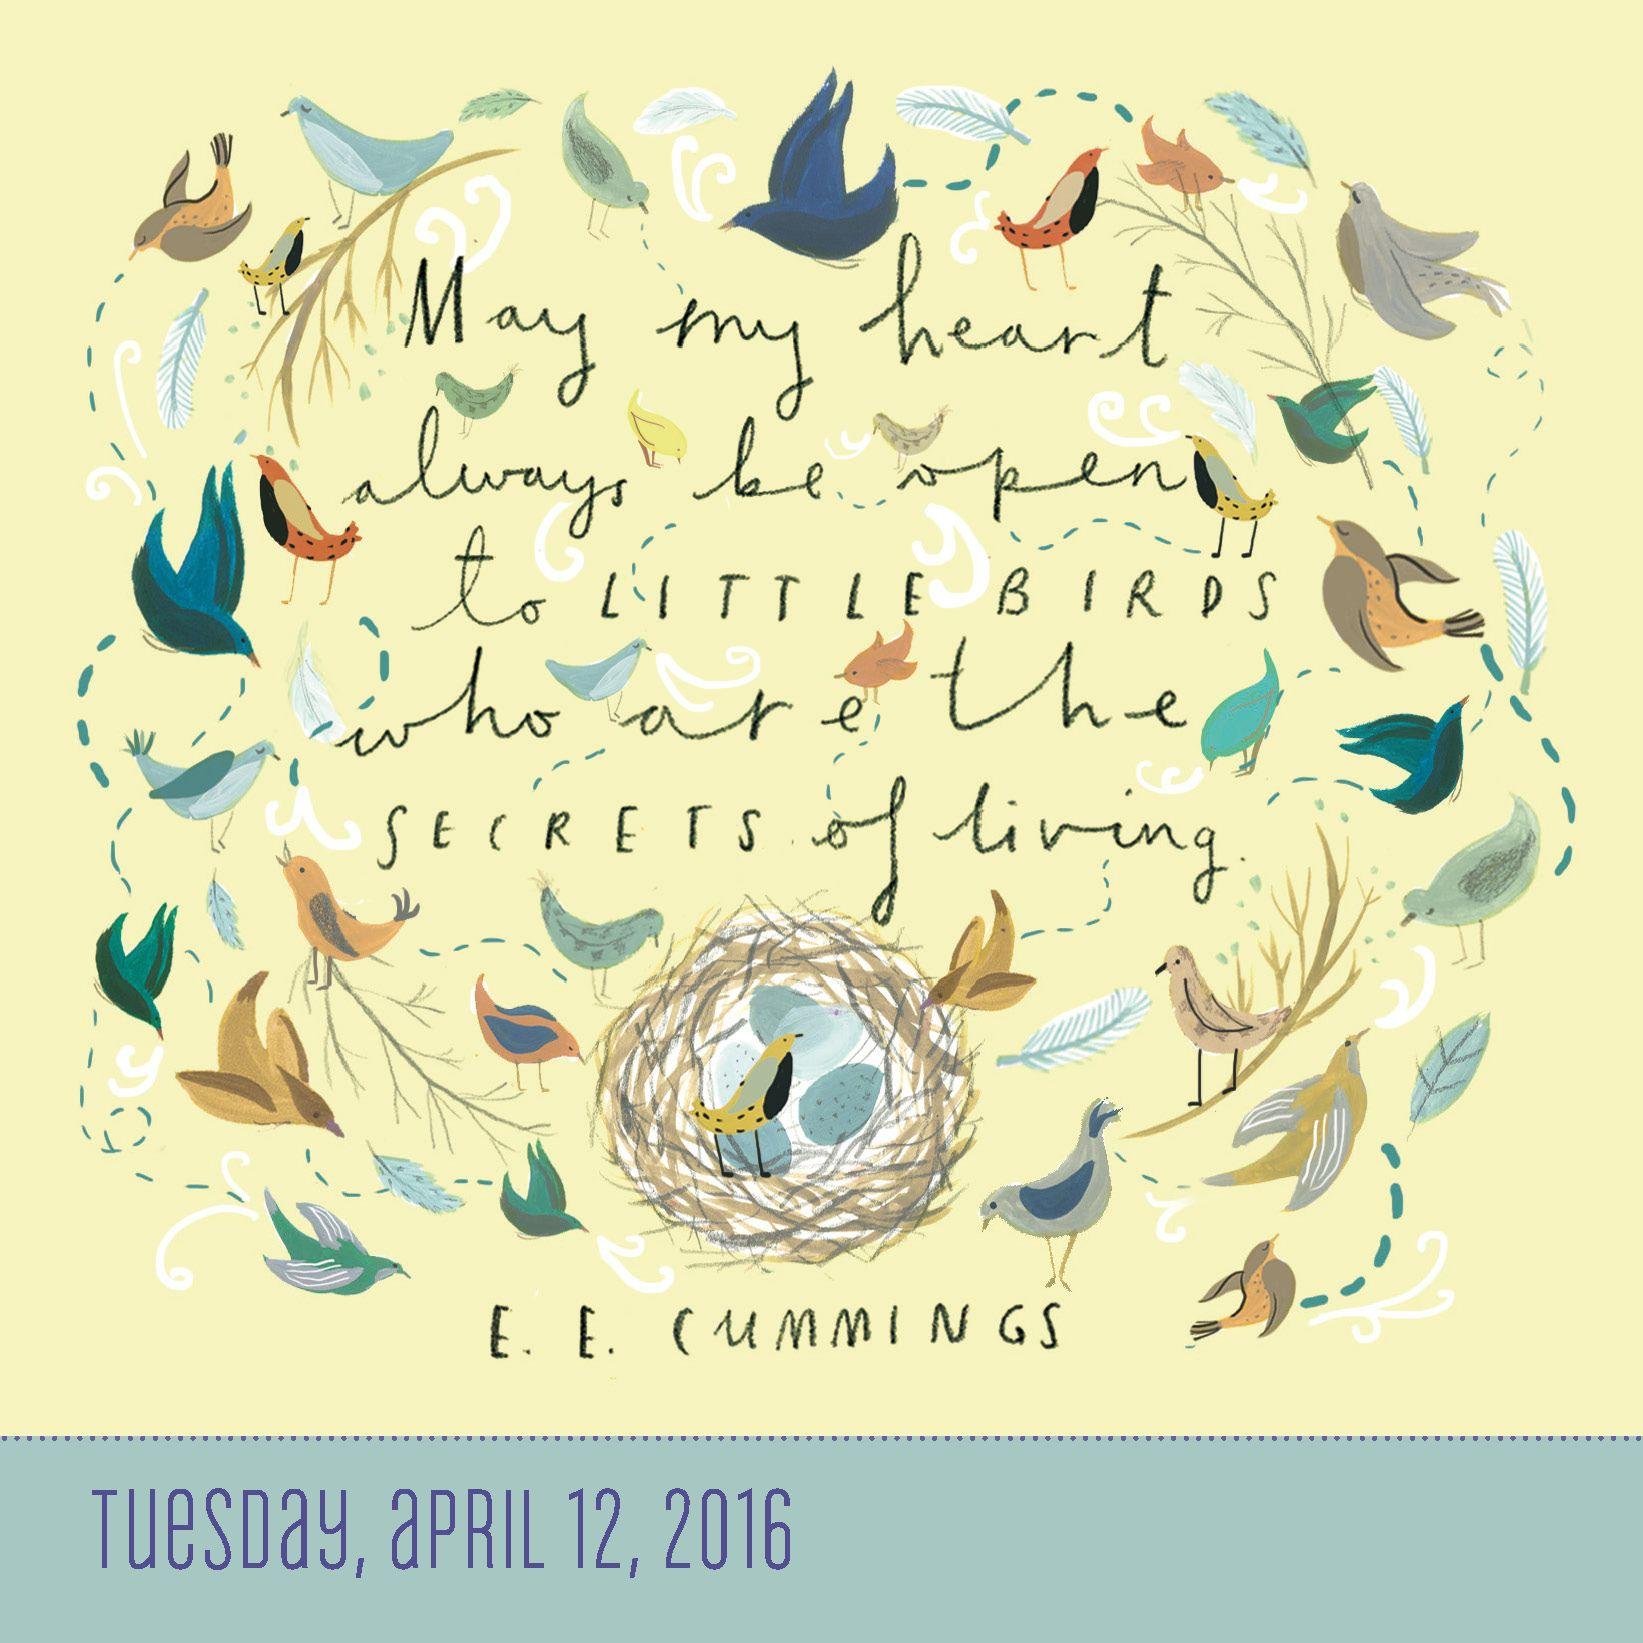 Ee Cummings Love Quotes – Amdo.info